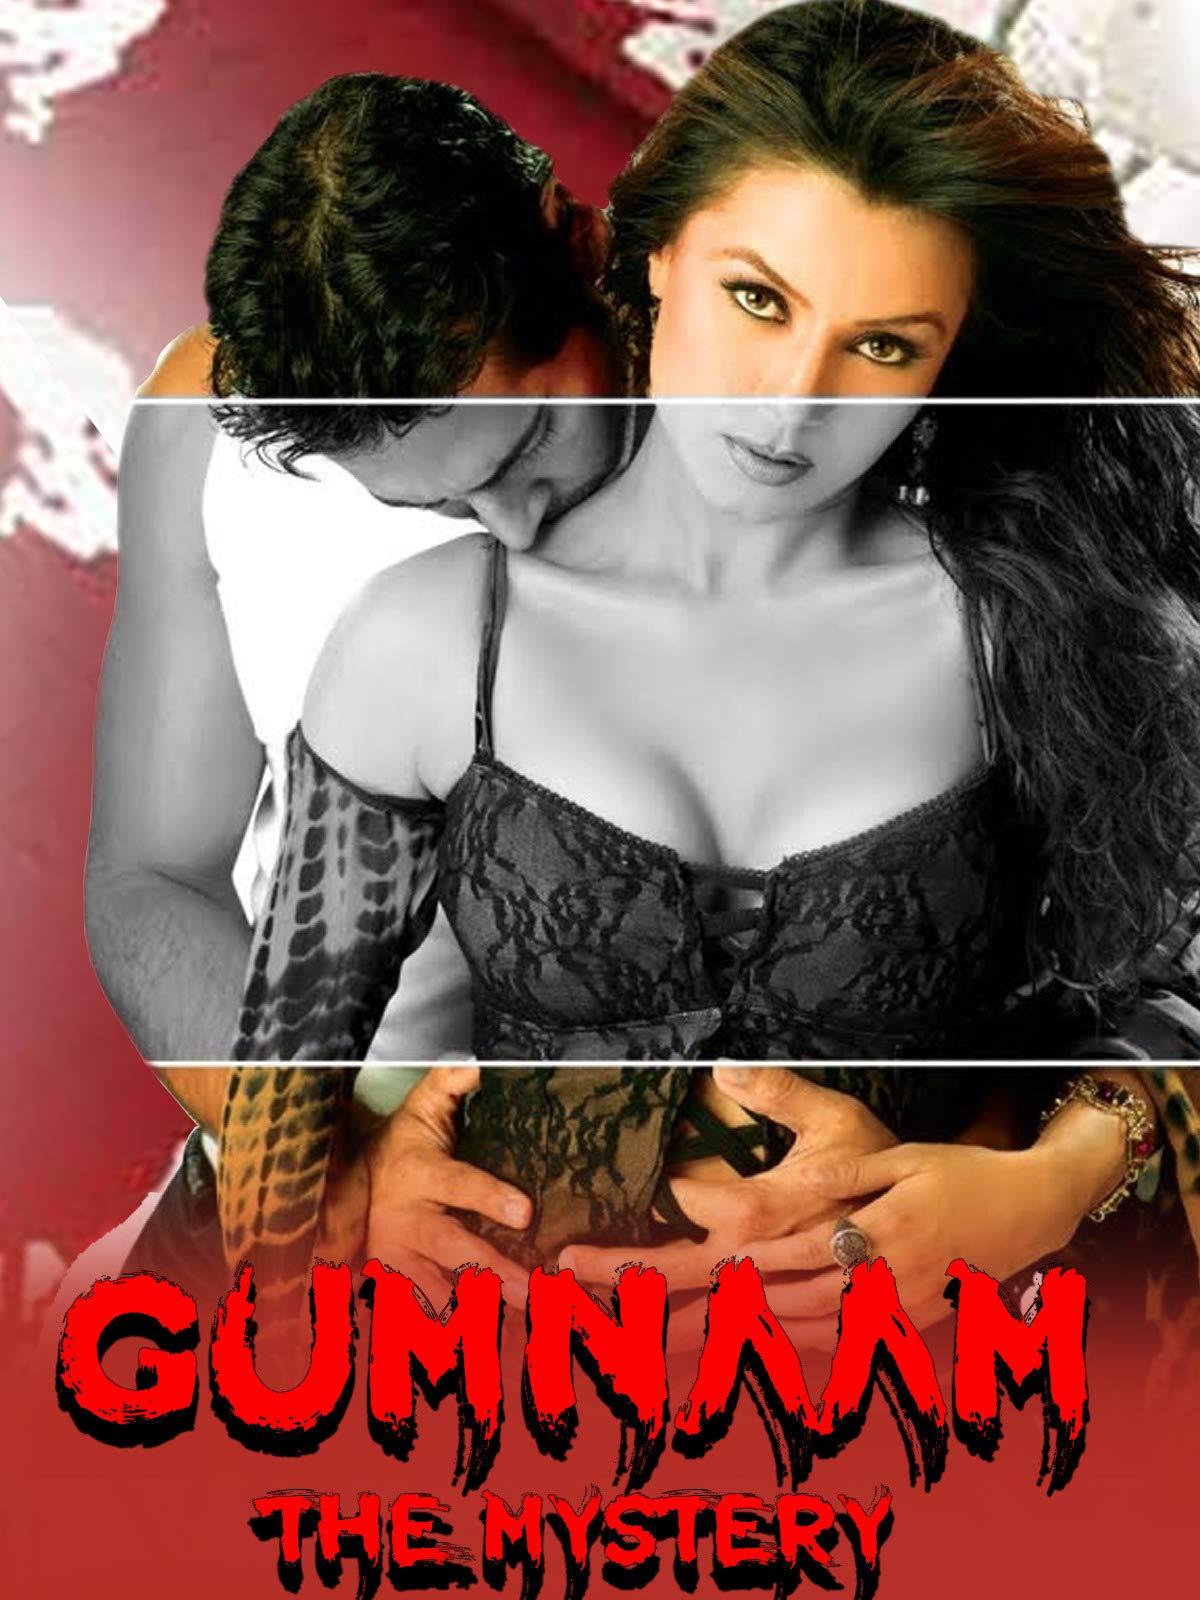 Gumnaam The Mystery 2008 Hindi Movie 720p AMZN HDRip 1.1GB Download